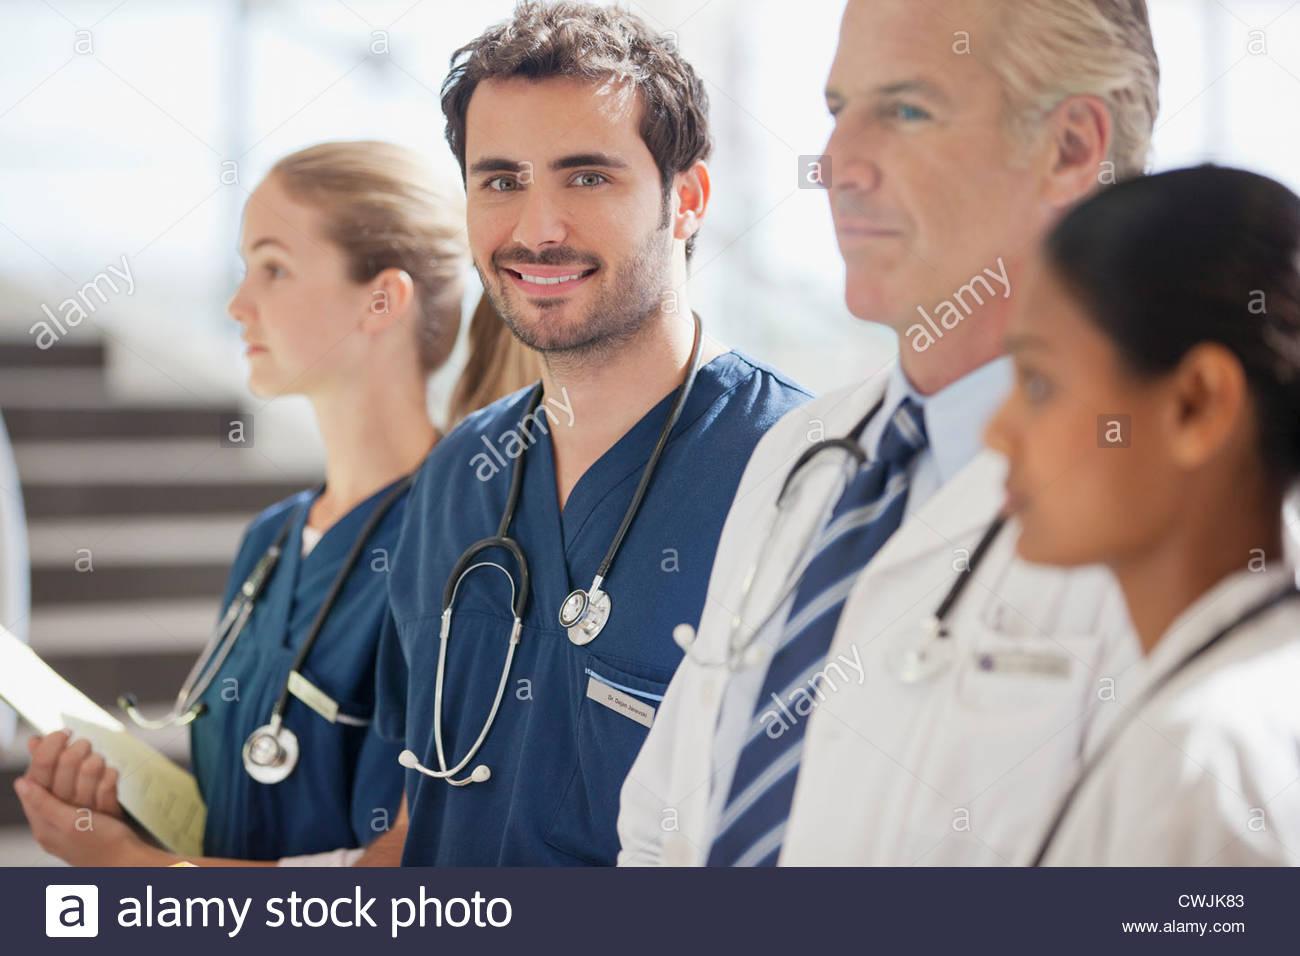 Portrait of smiling nurse with doctors - Stock Image